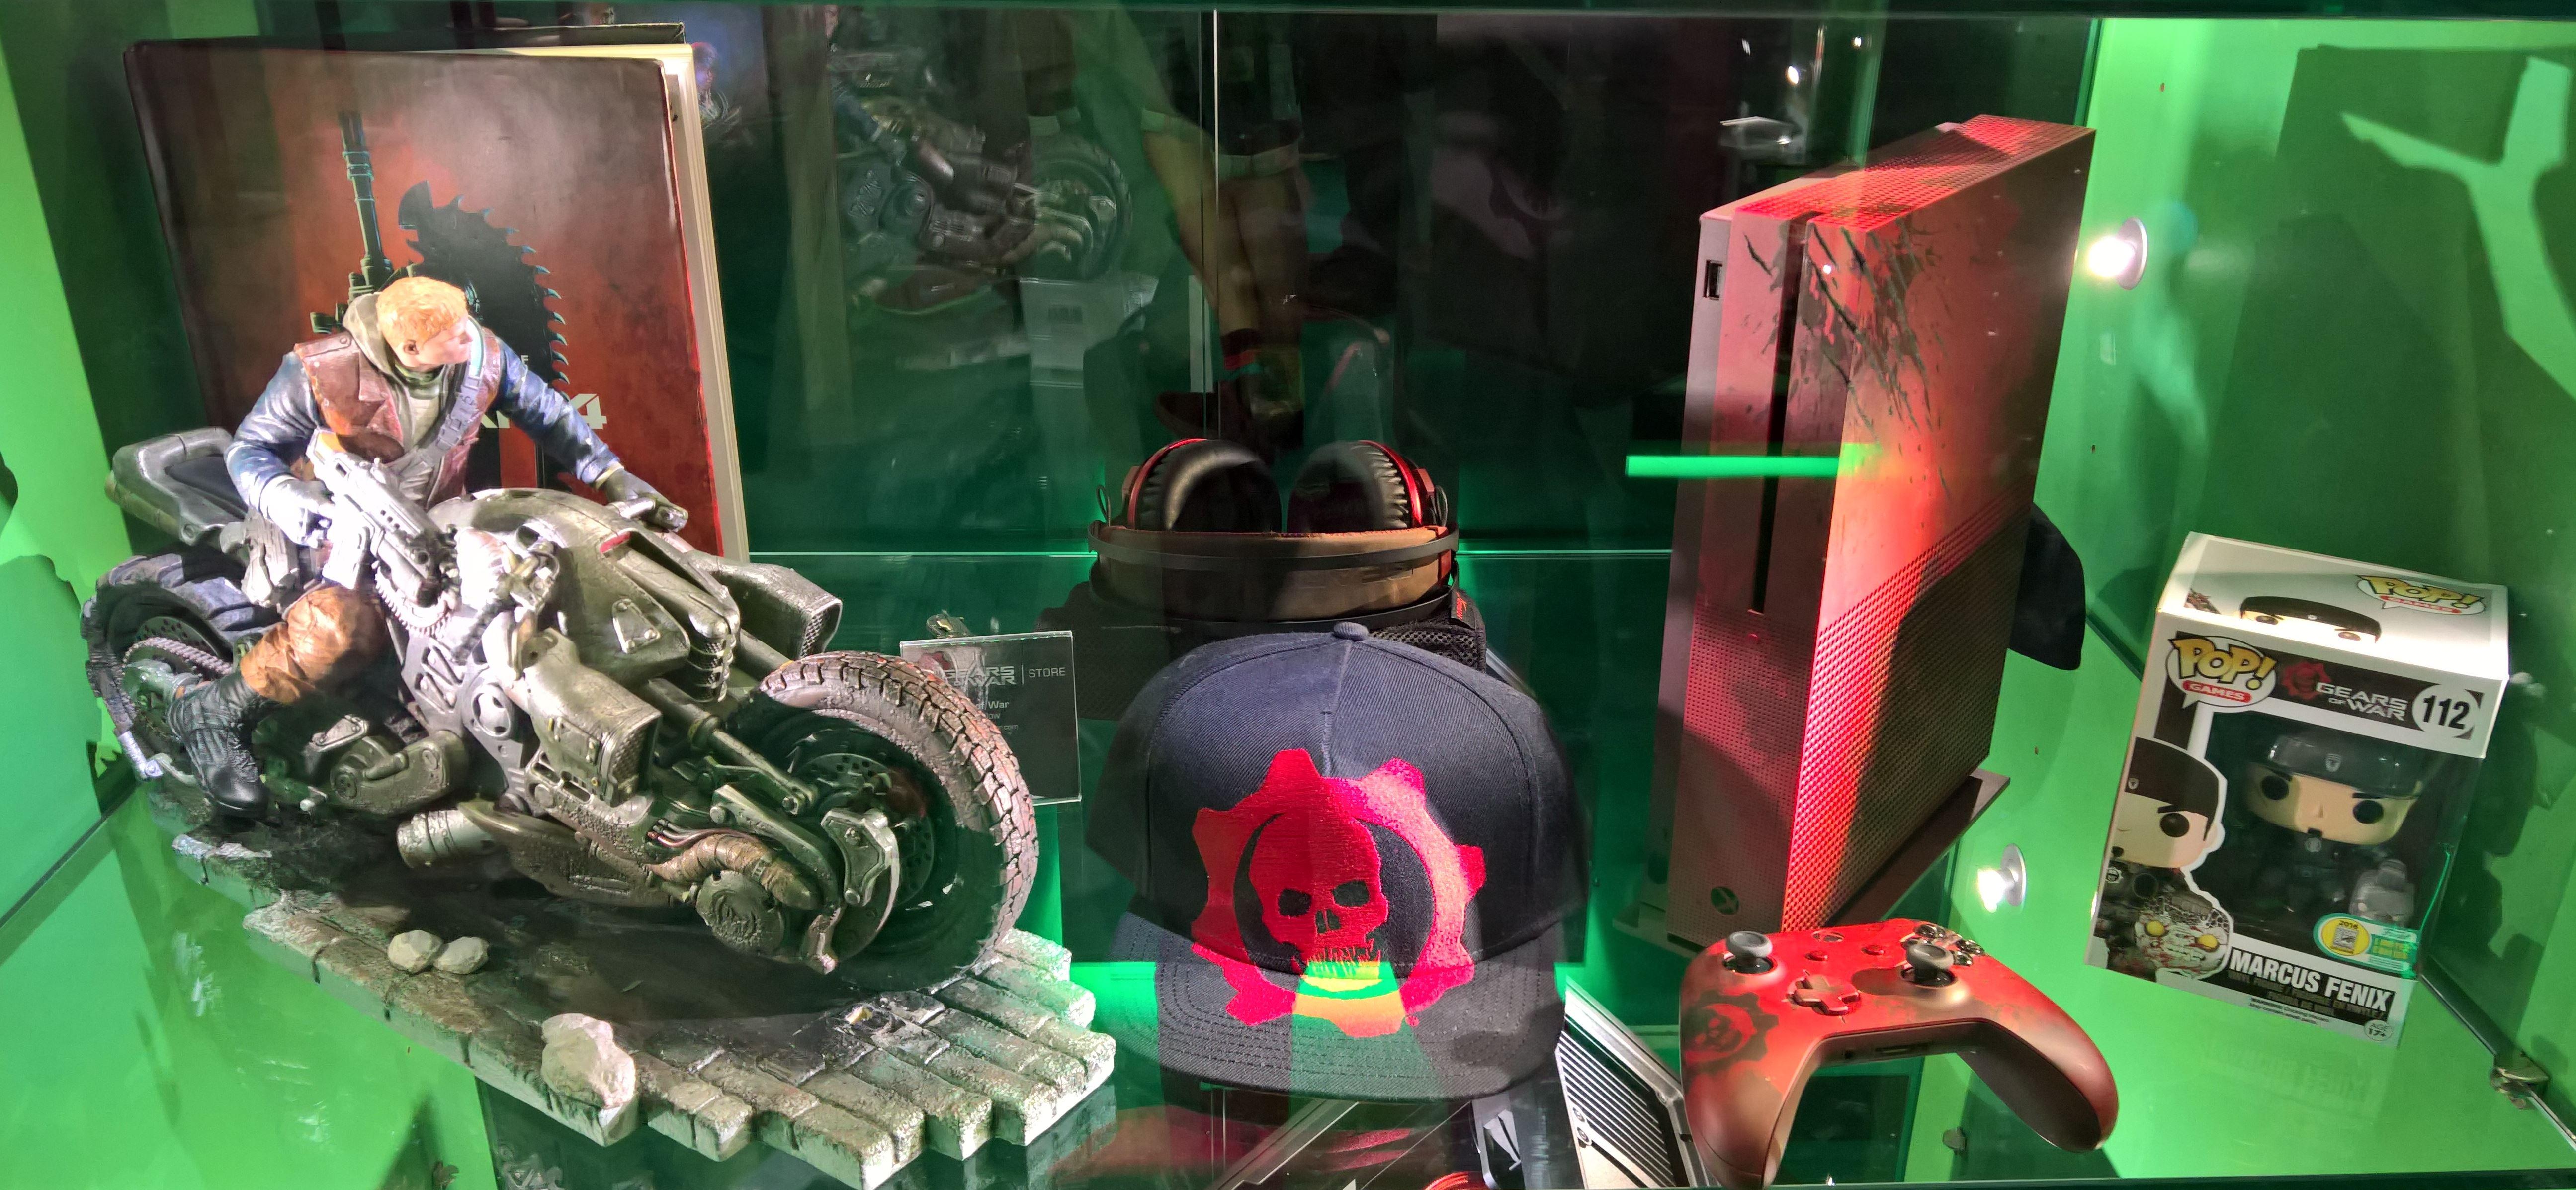 Gears of War 4 Figur und Konsole